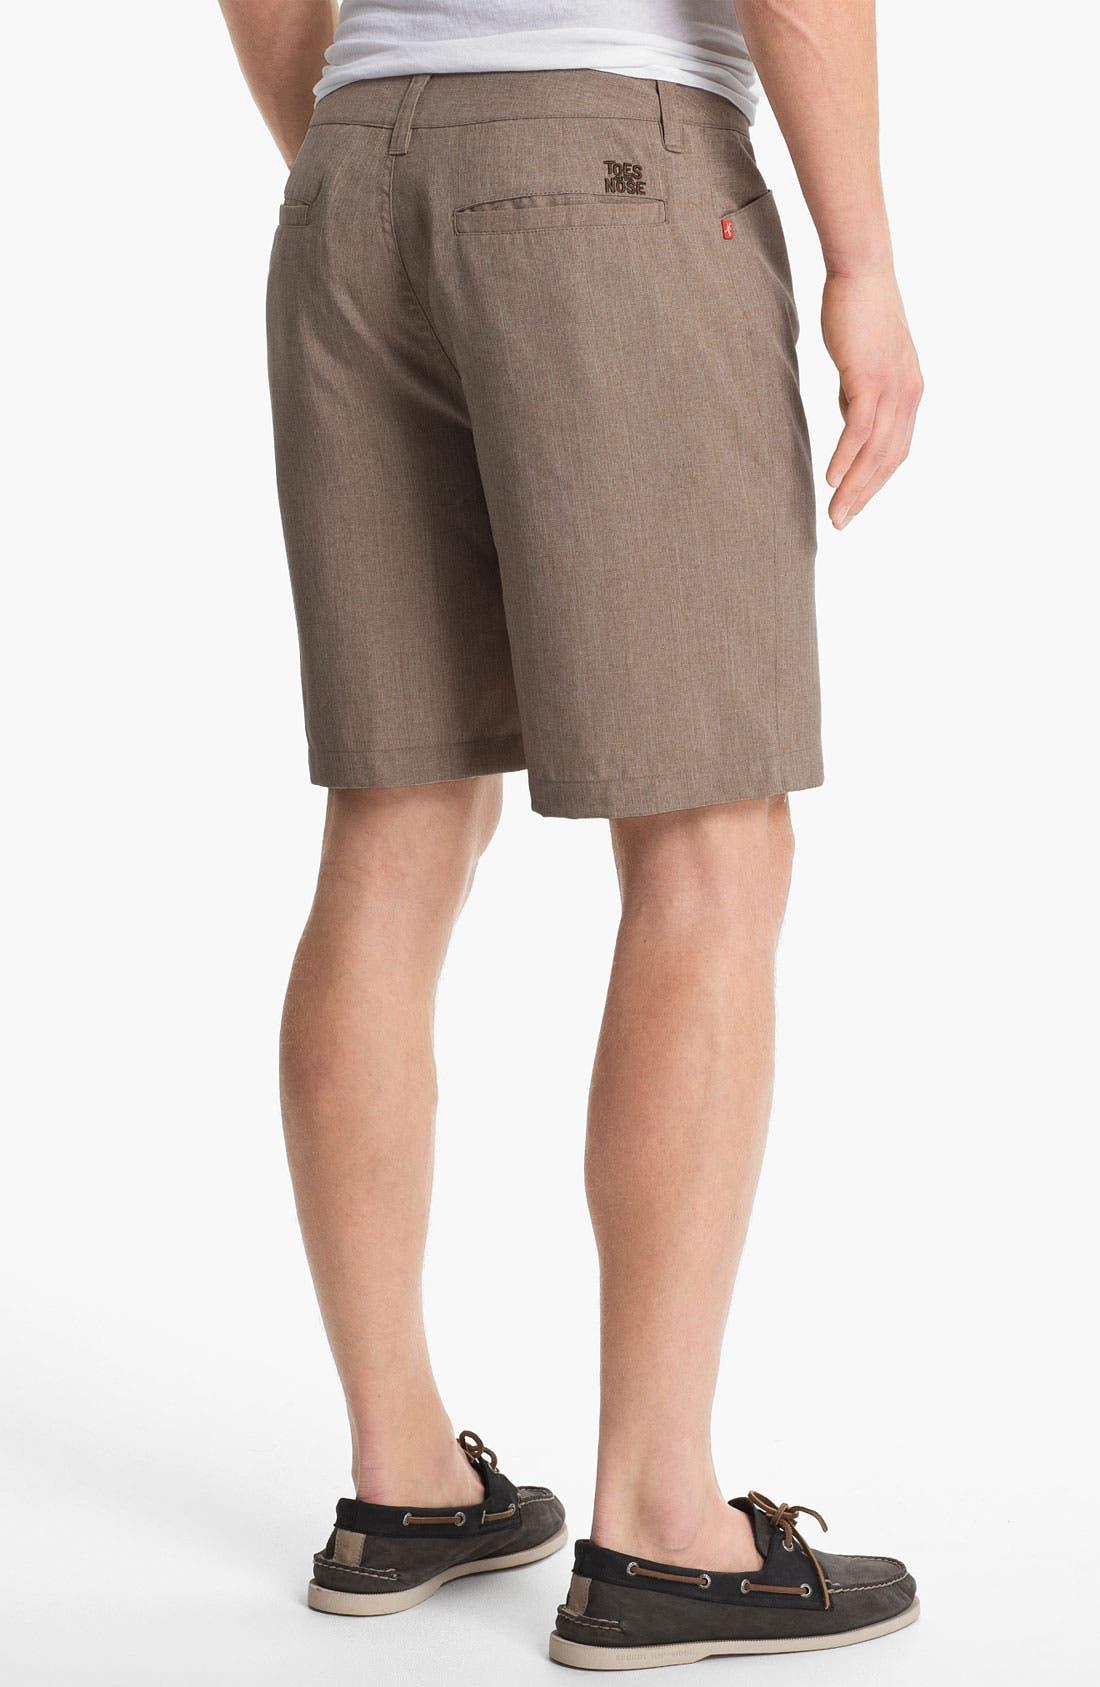 Alternate Image 2  - Toes on the Nose 'Rocker' Khaki Shorts